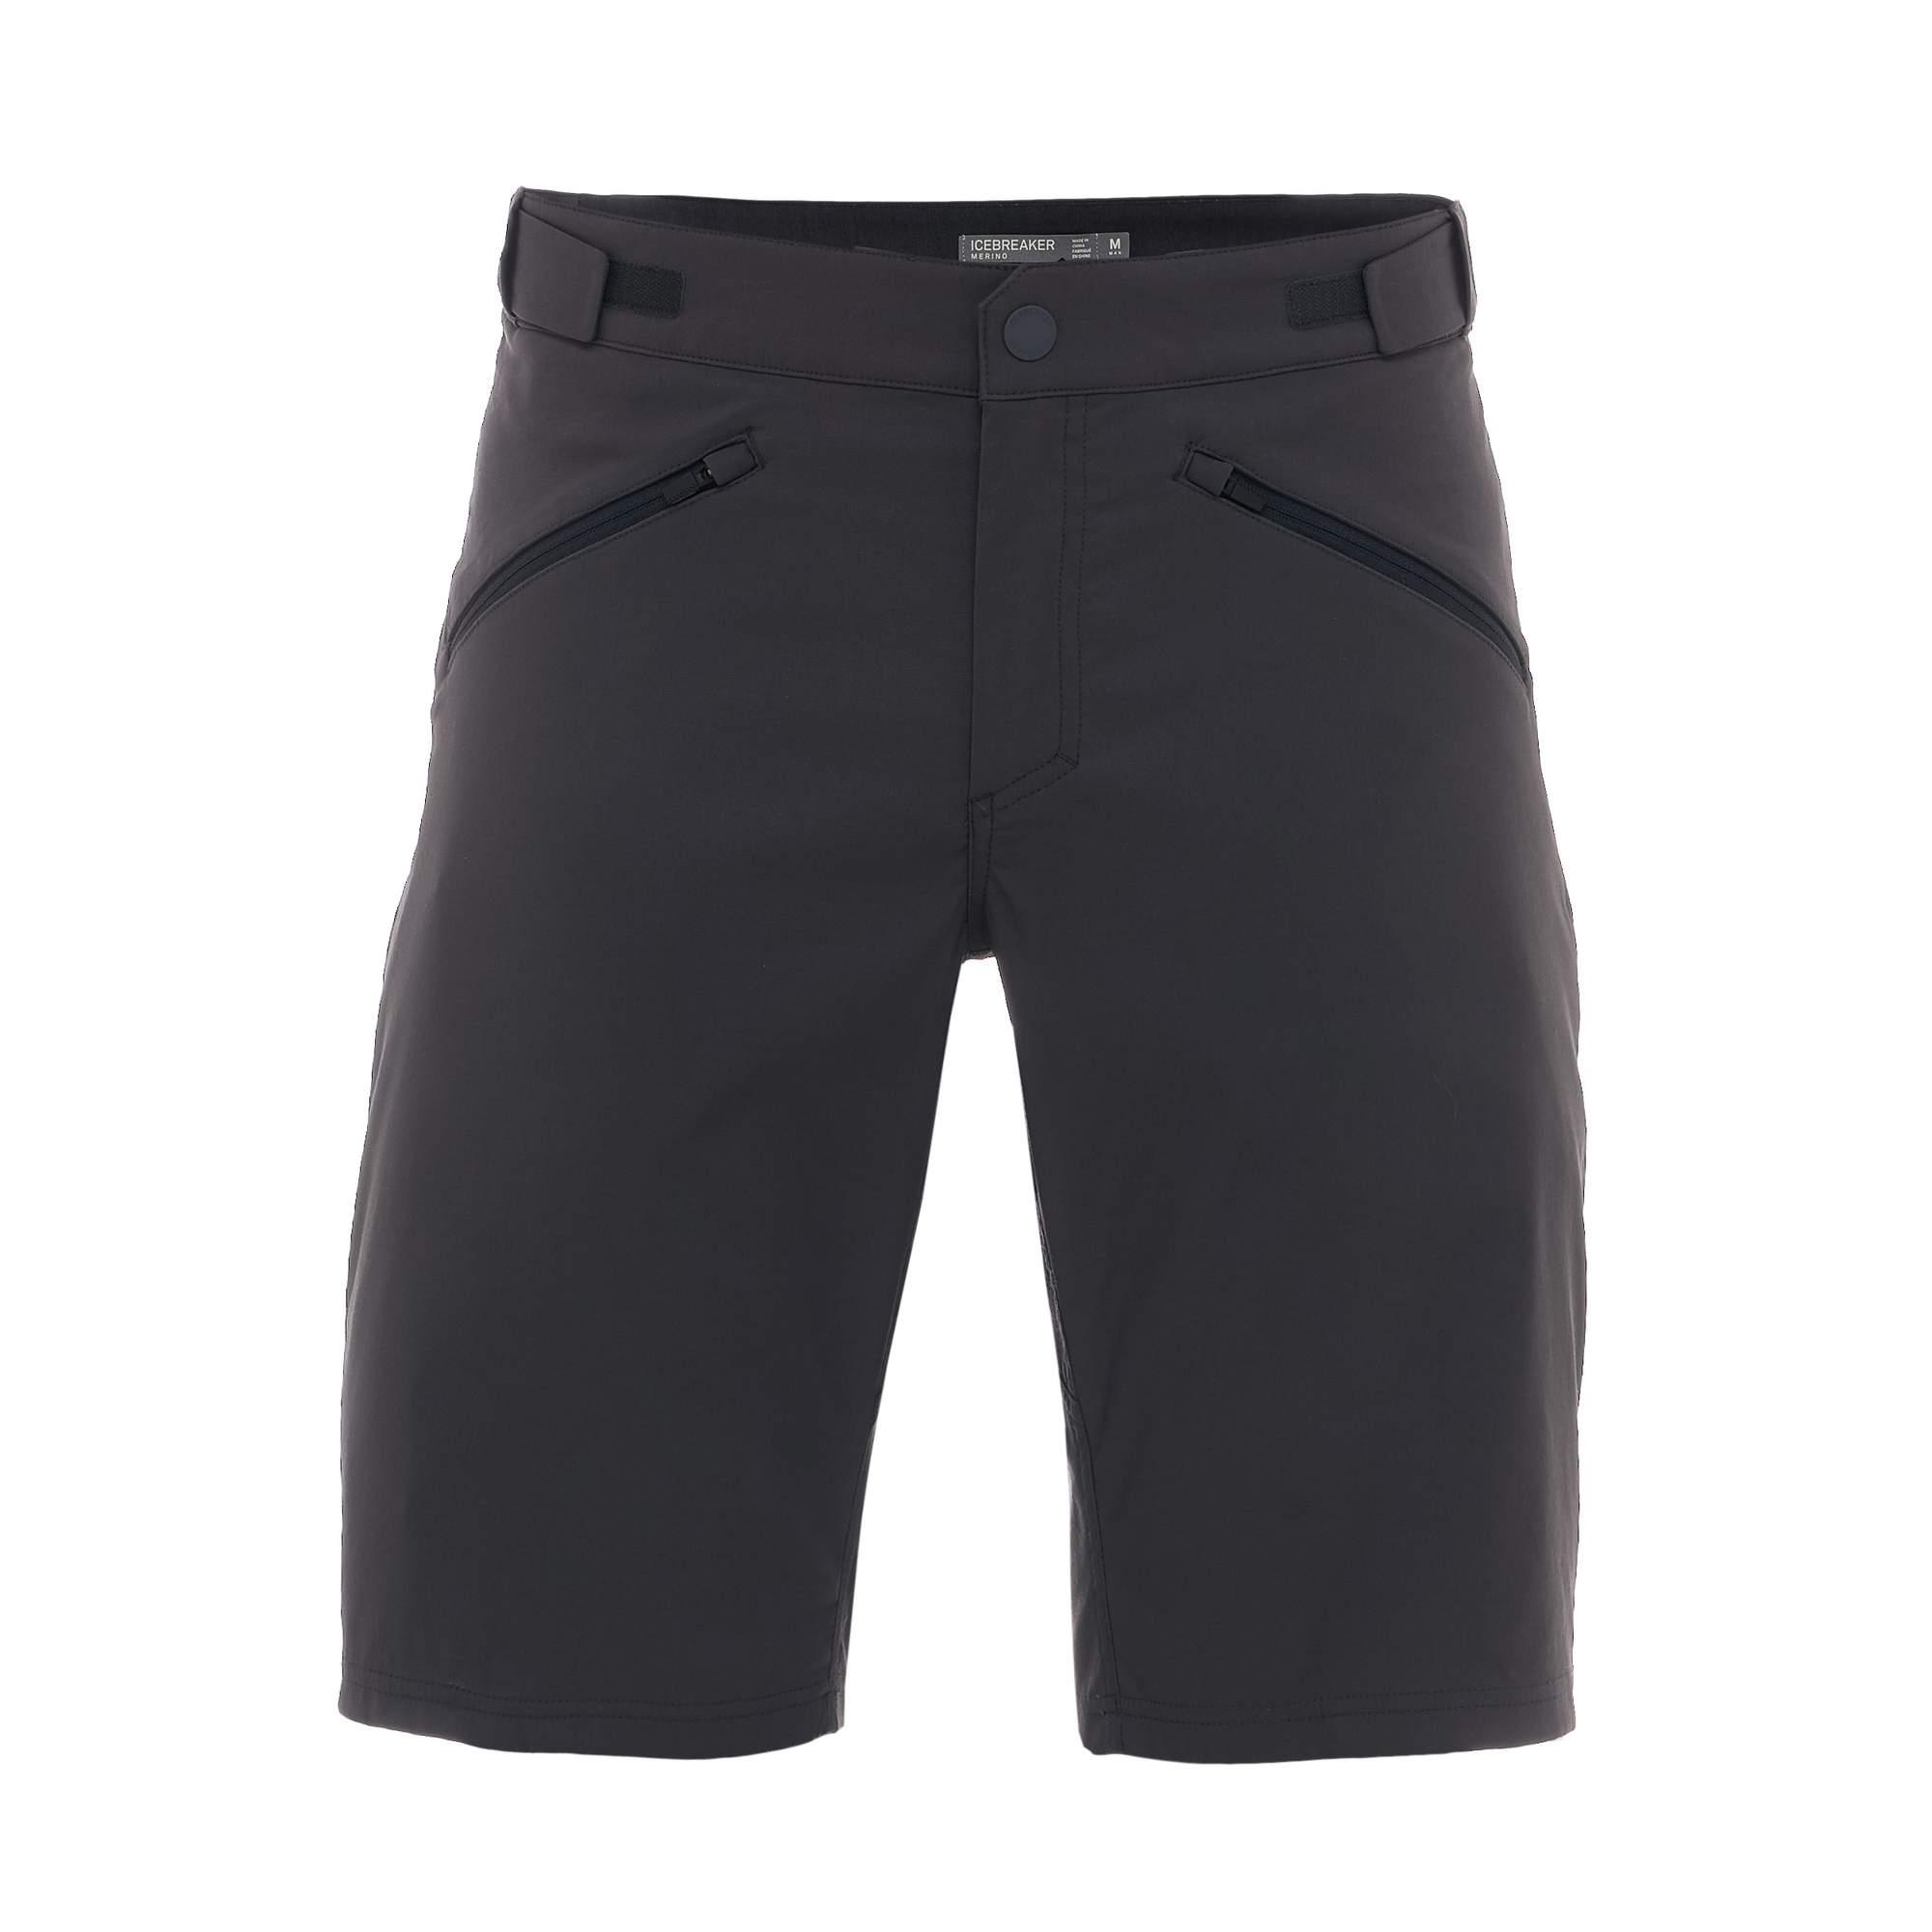 Icebreaker Persist Shorts Männer Gr. L - Trekkinghose - grau